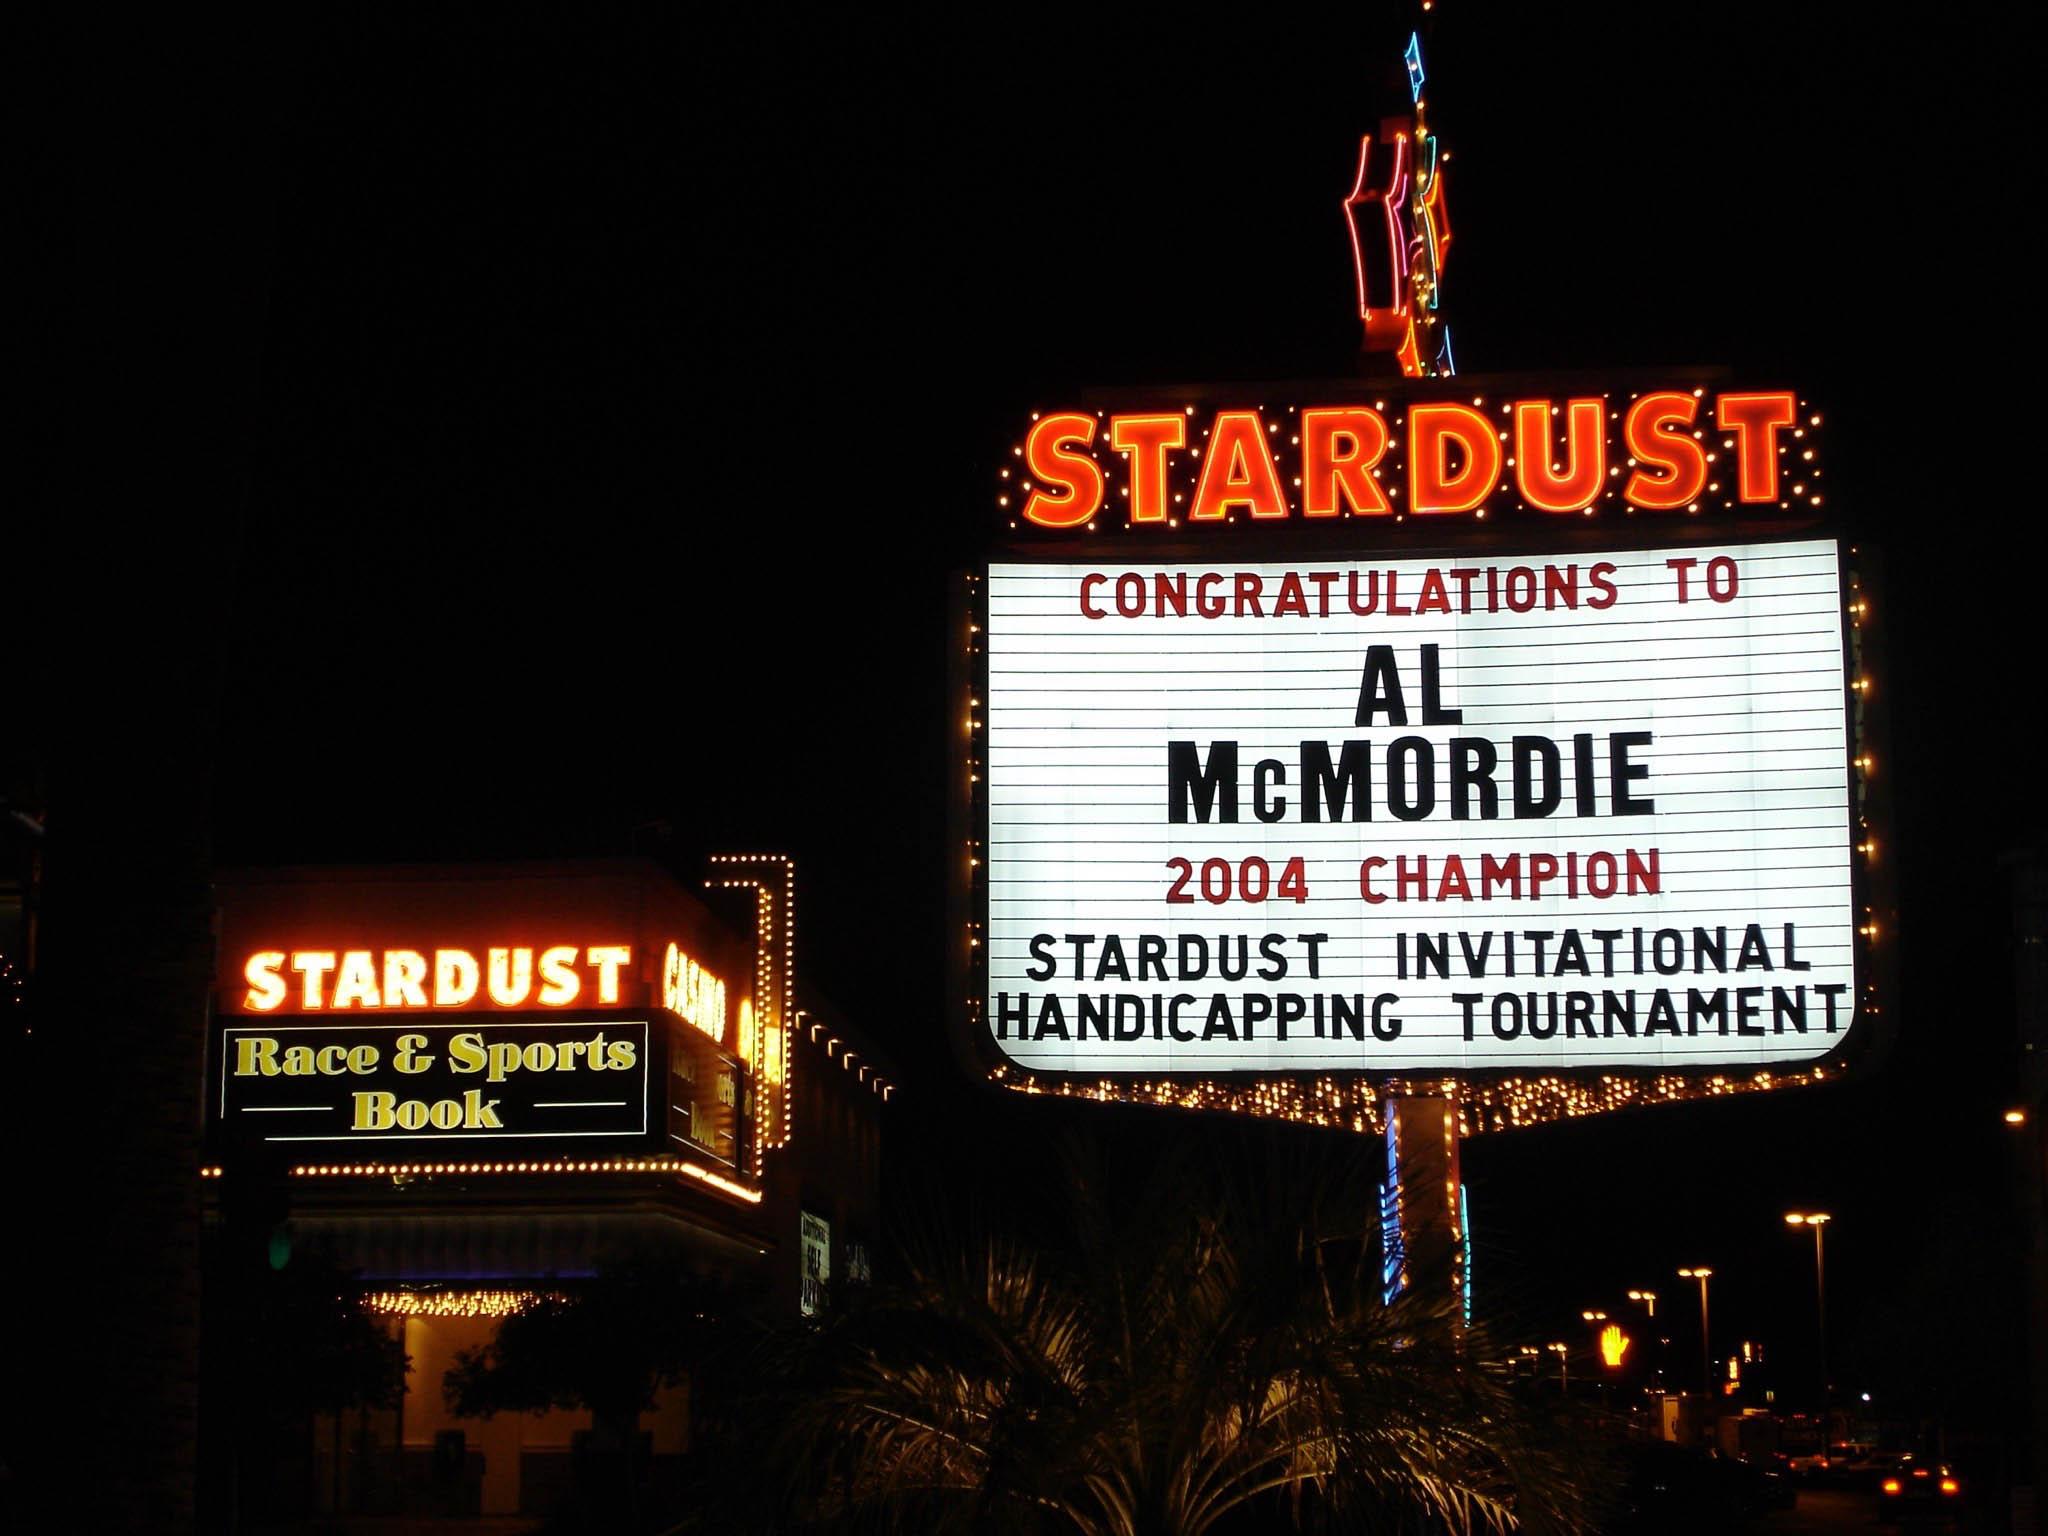 Stardust Invitational Handicapping Tournament Champion